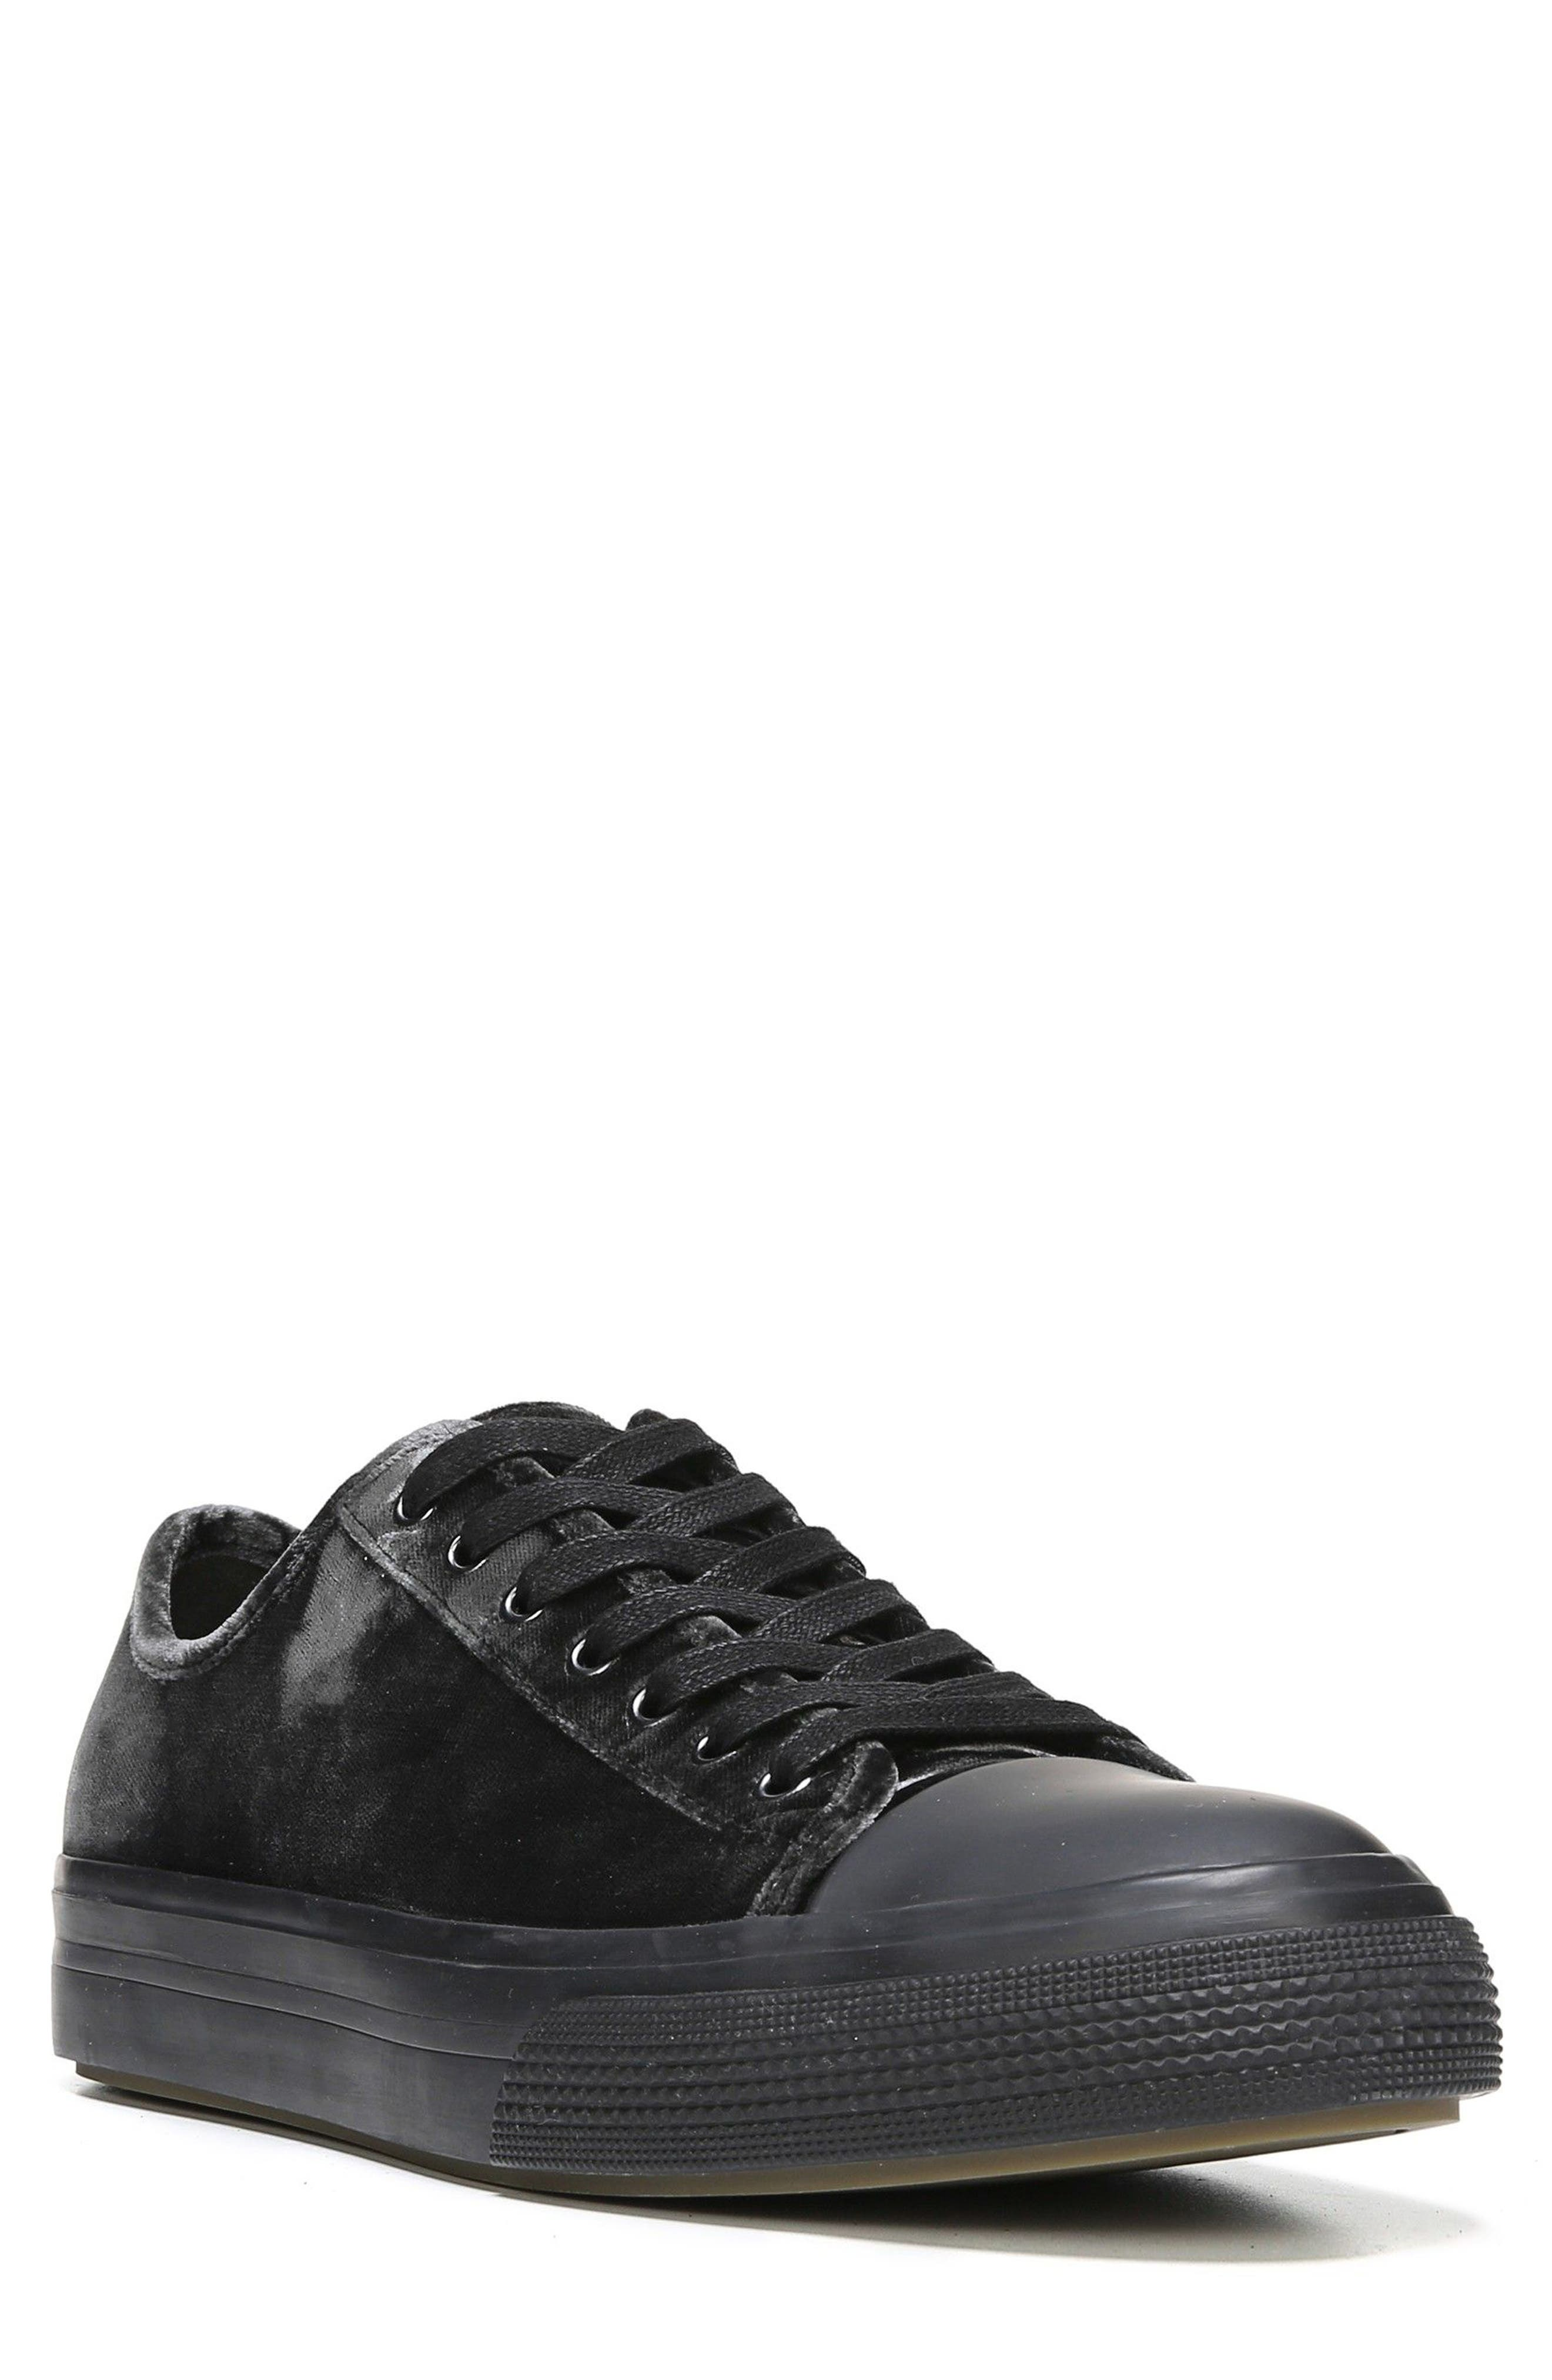 Tiller Sneaker,                         Main,                         color, Graphite/ Black